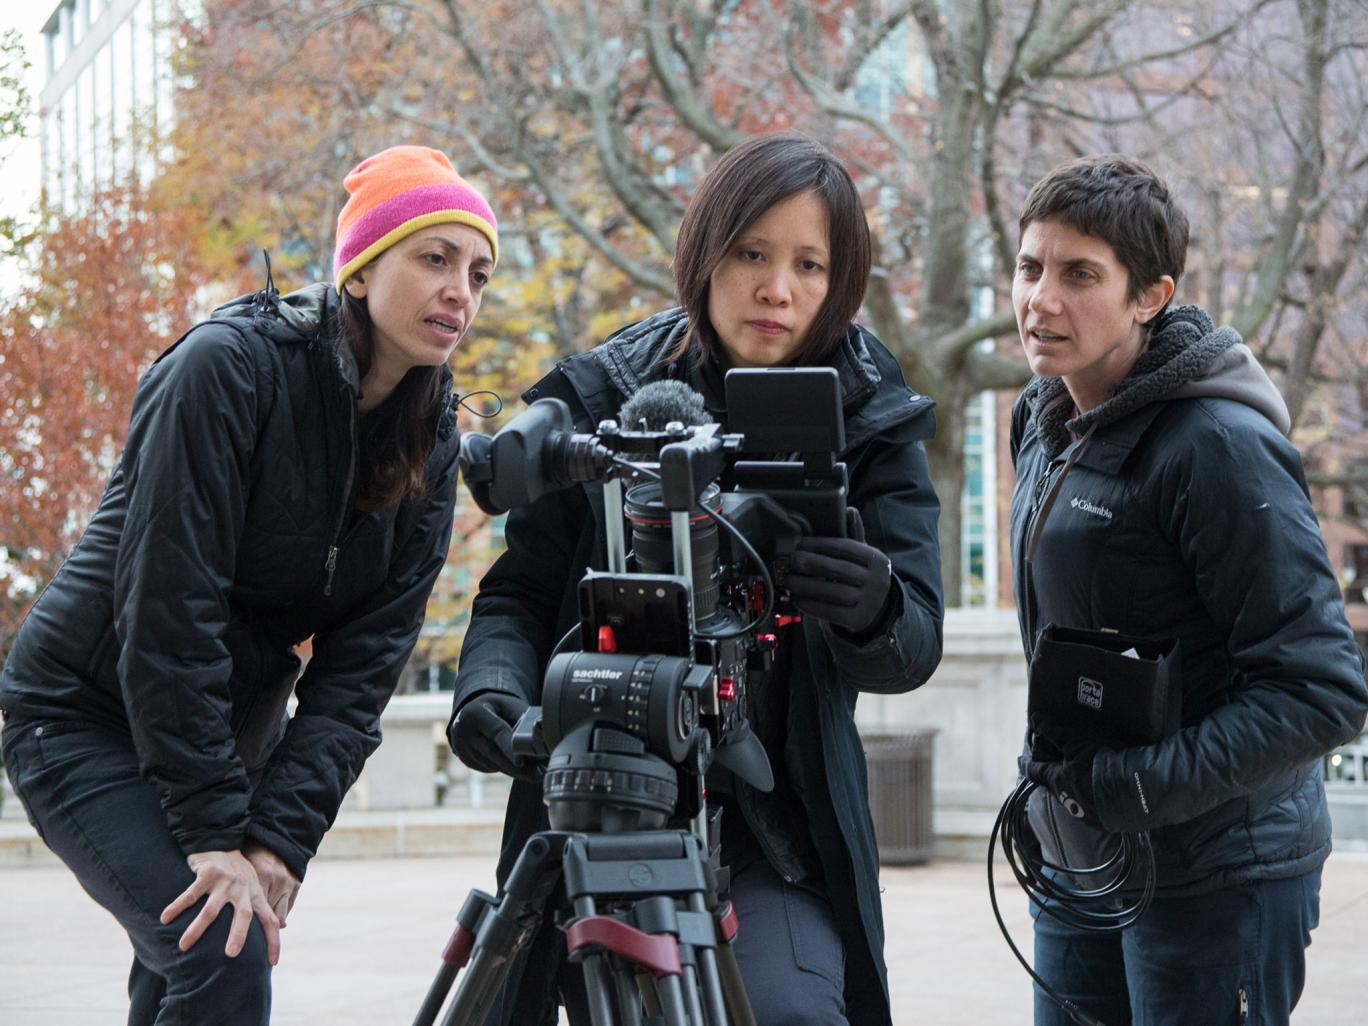 The Making a Murderer filmmakers